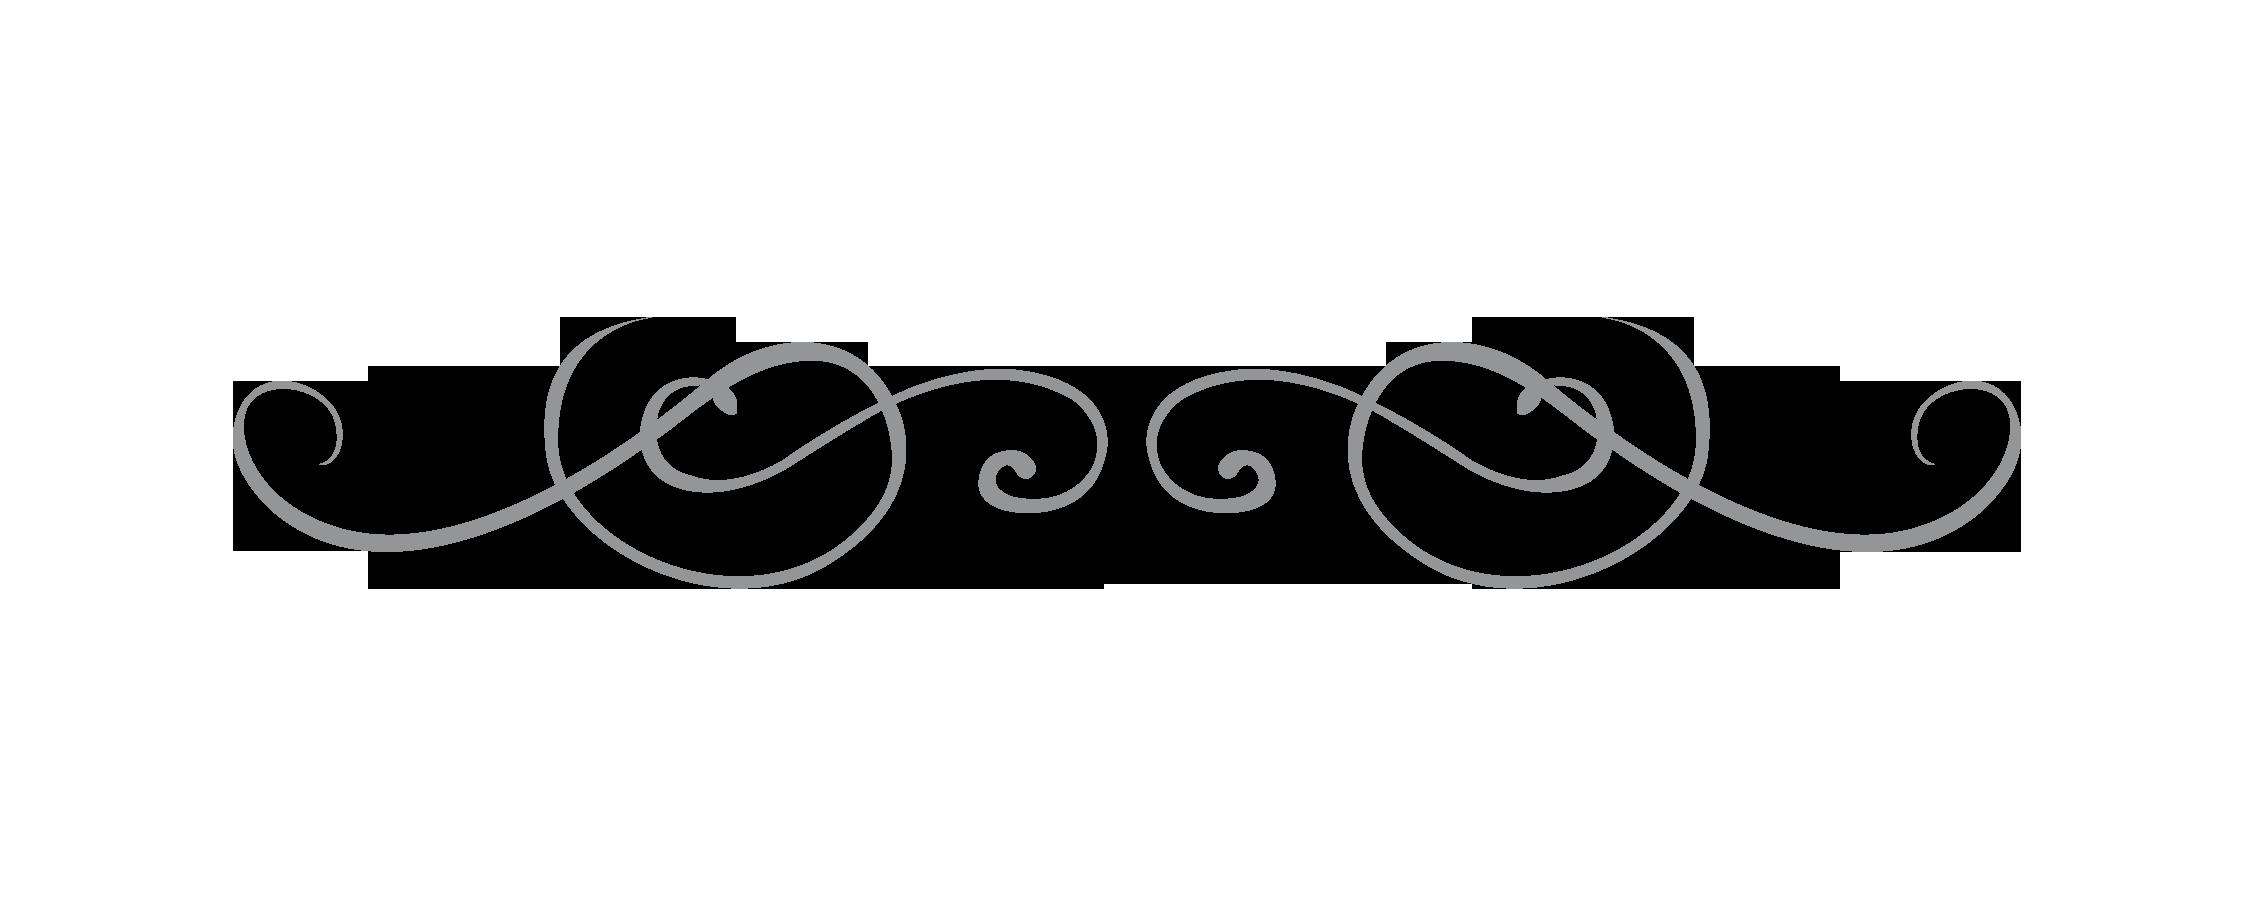 Wedding Invitation Background Designs Png Matik For